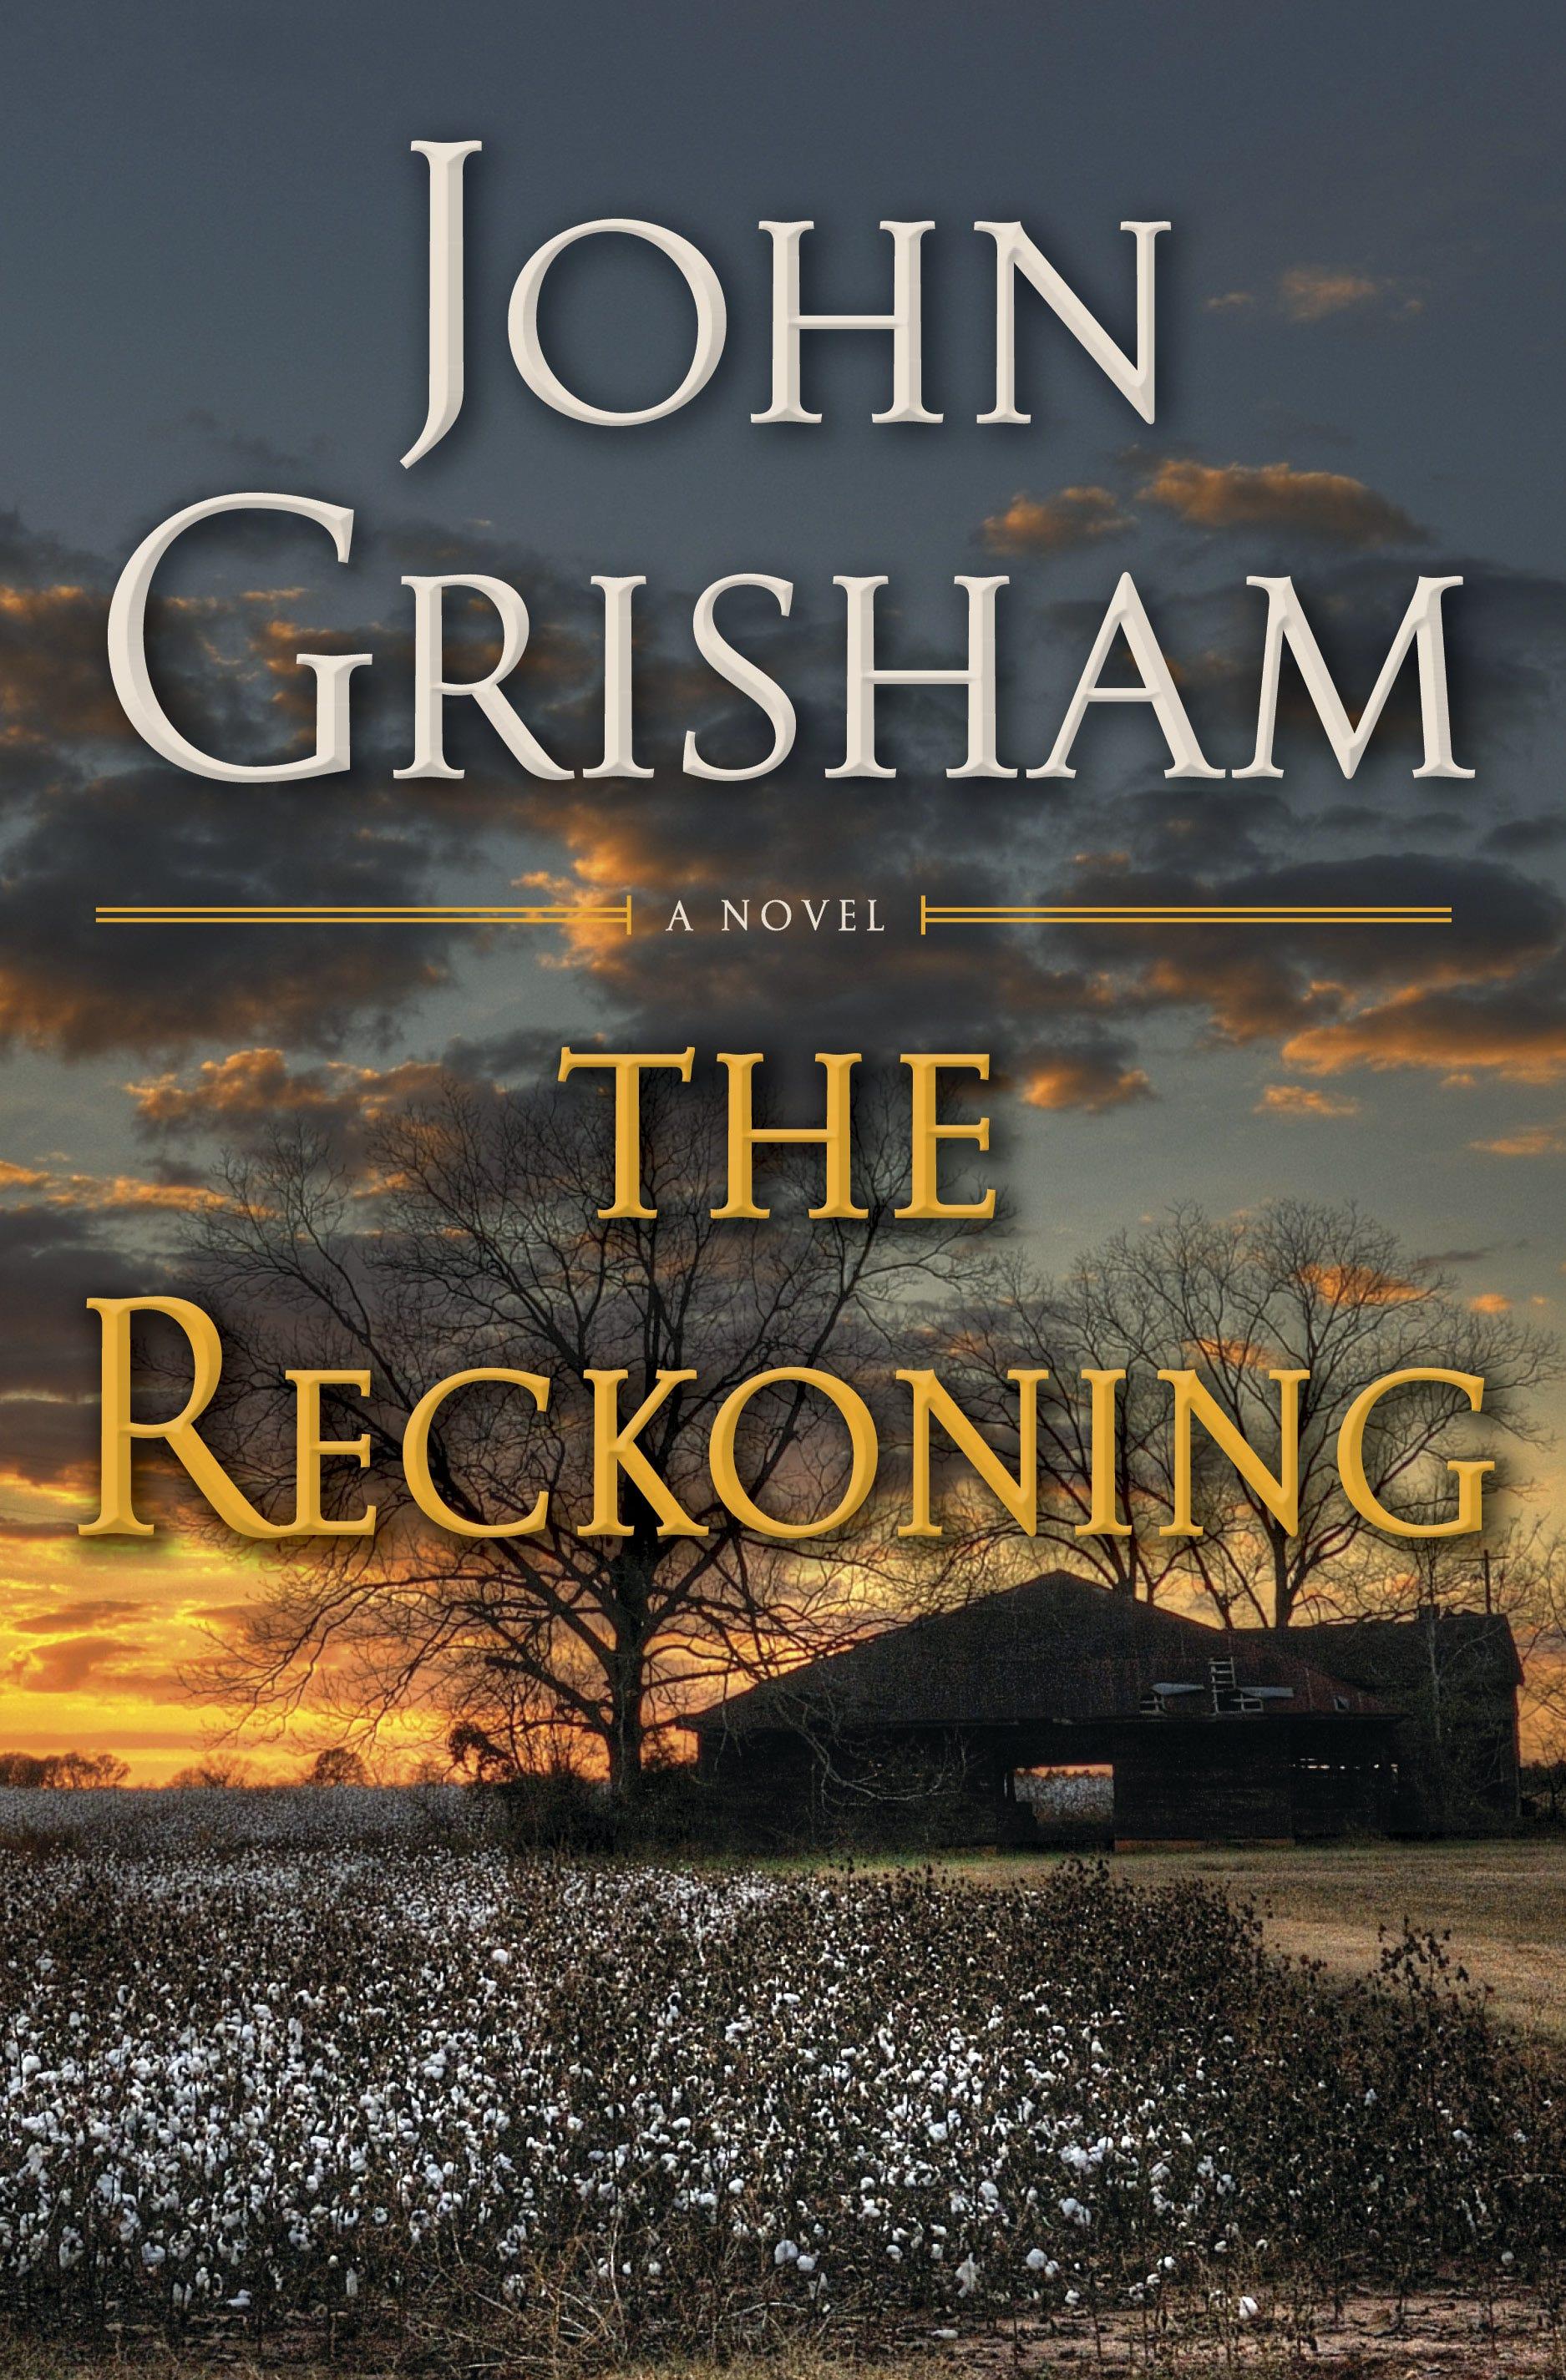 5-new-books-not-to-miss-this-week-john-grisham-roger-daltrey-rupaul